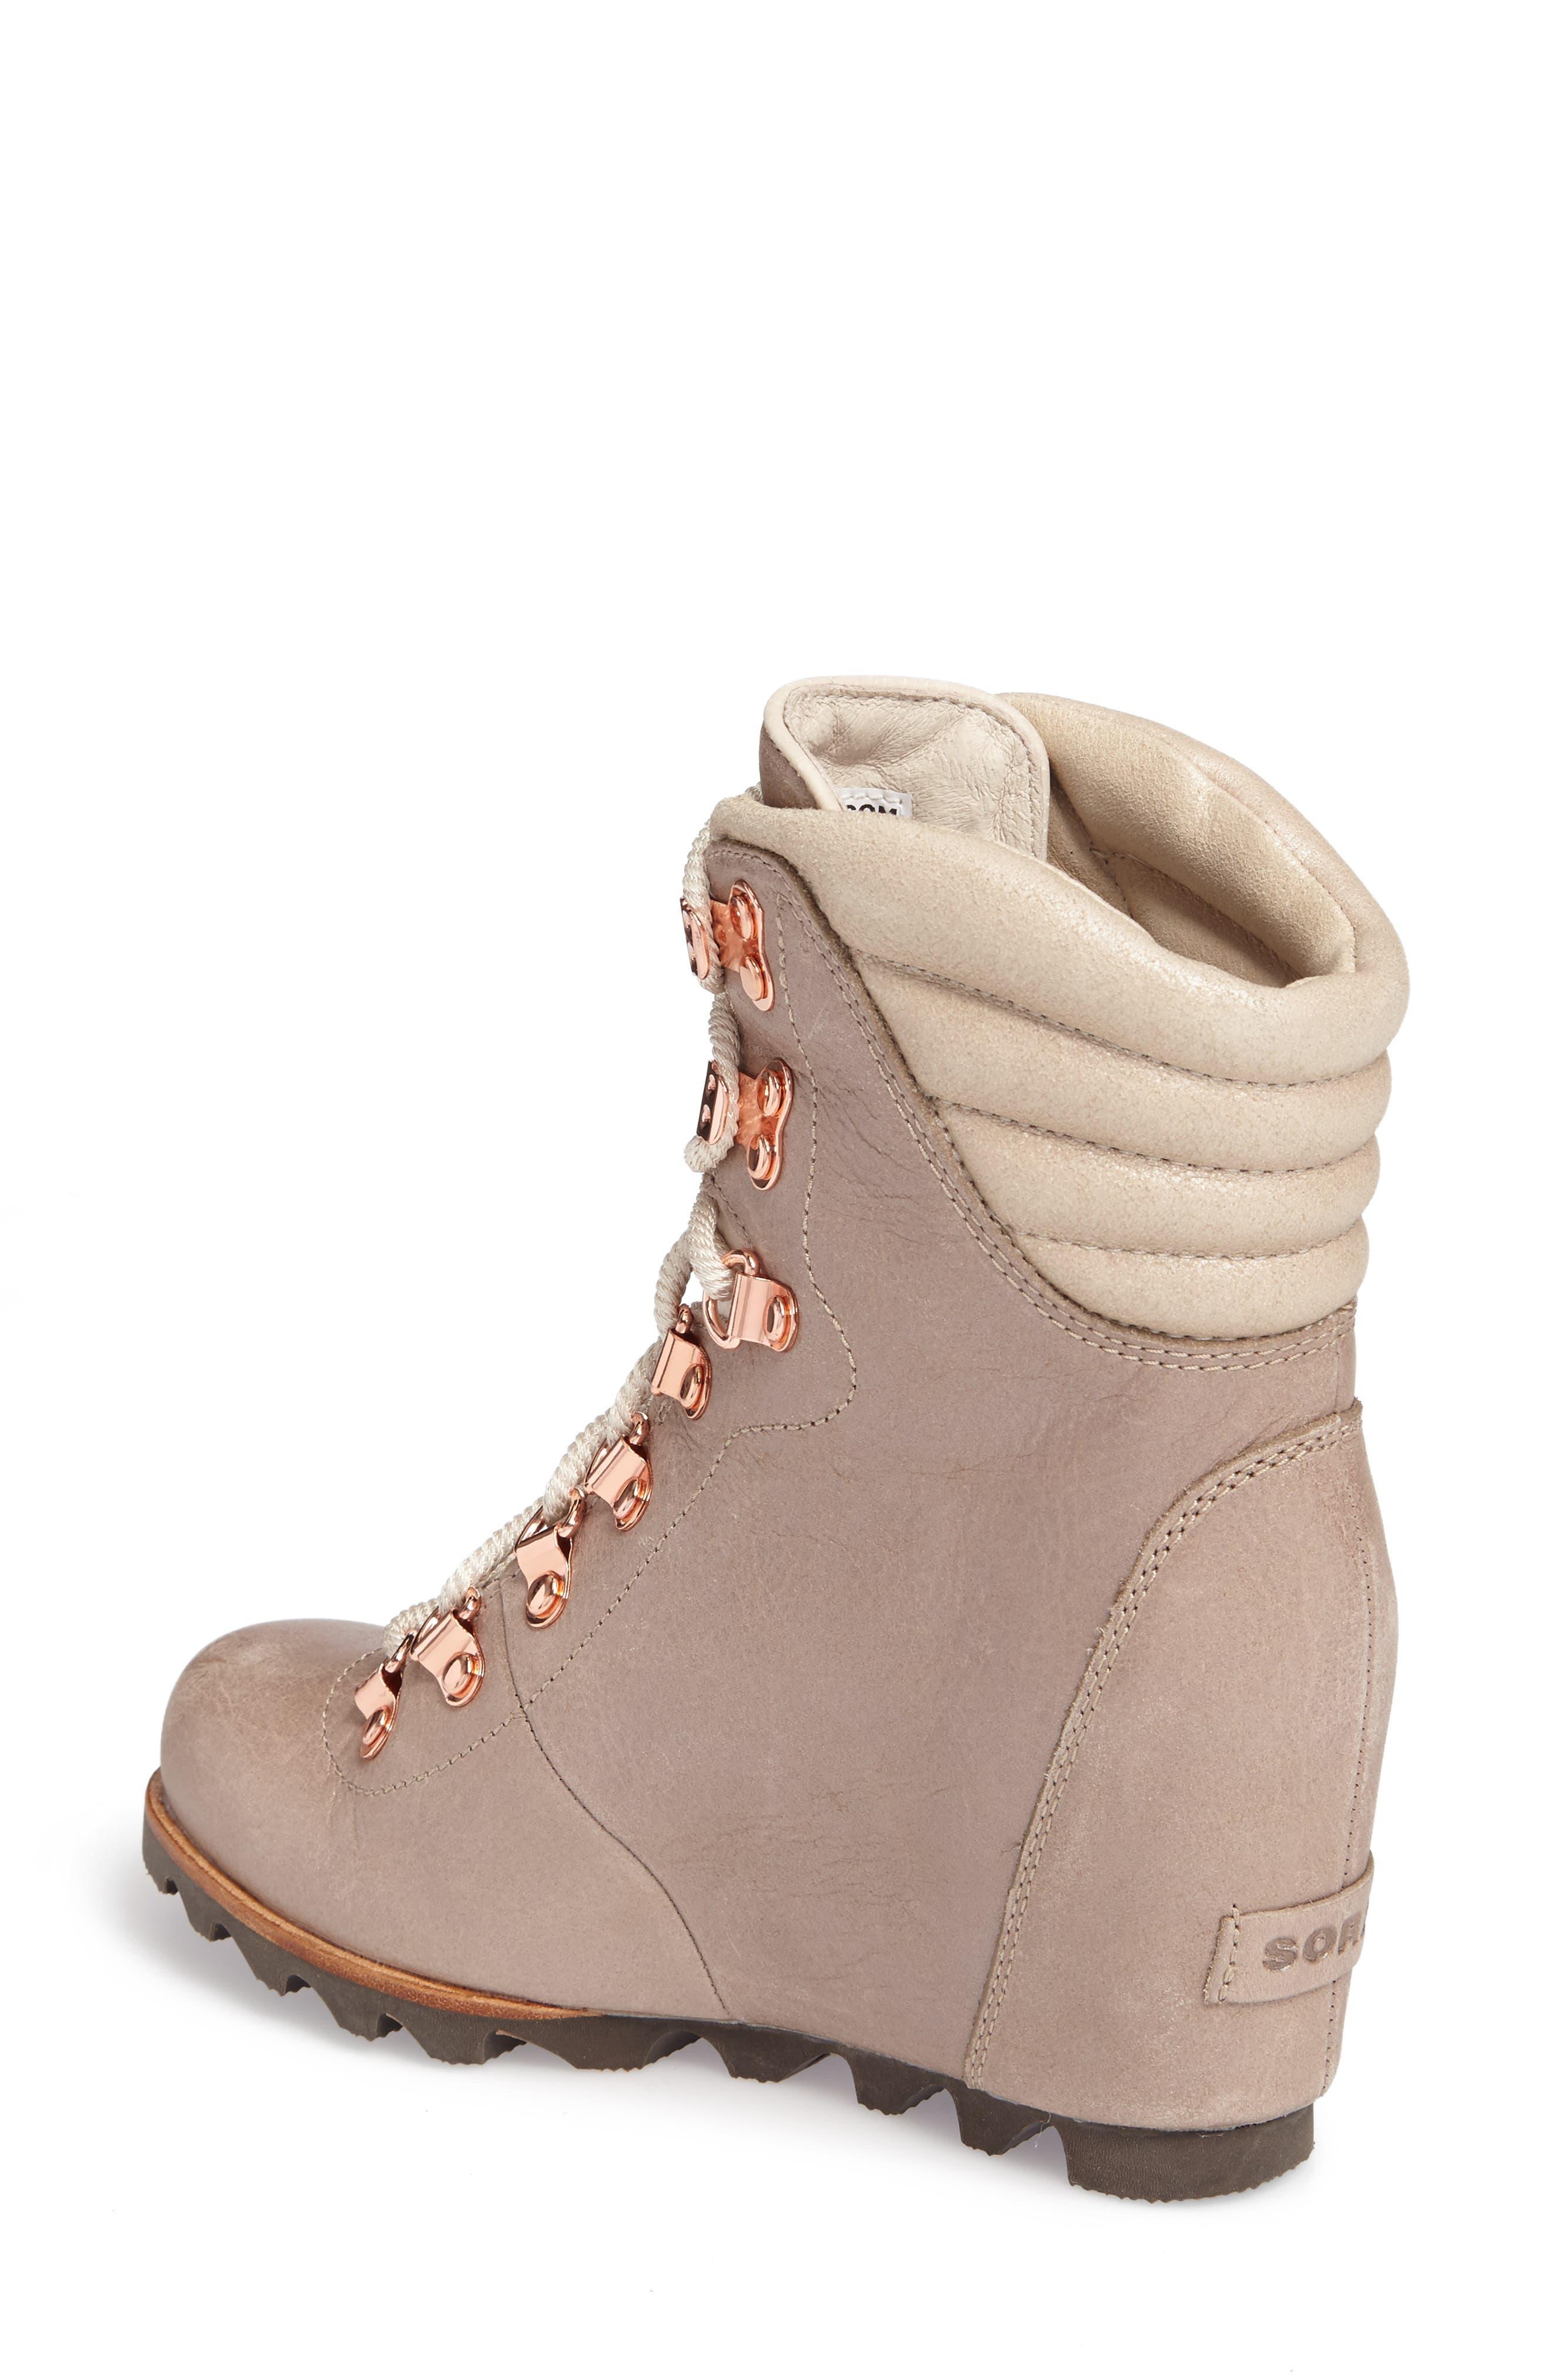 Alternate Image 2  - SOREL 'Conquest' Waterproof Wedge Boot (Women)